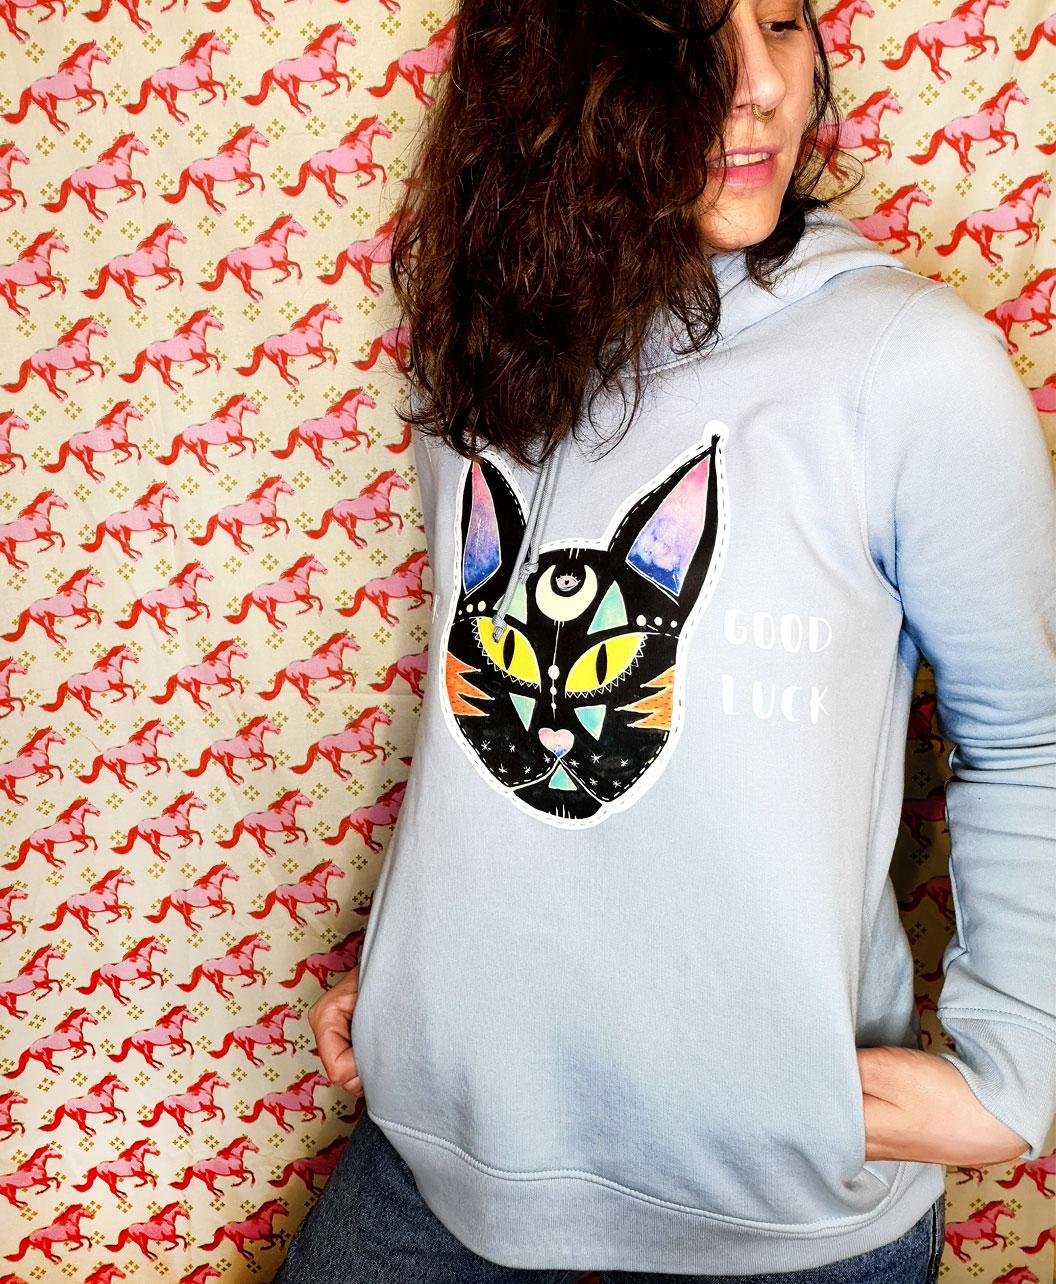 sudadera algodon organico mujer capucha bolsillos azul ilustracion original y frases gato negro black cat good luck